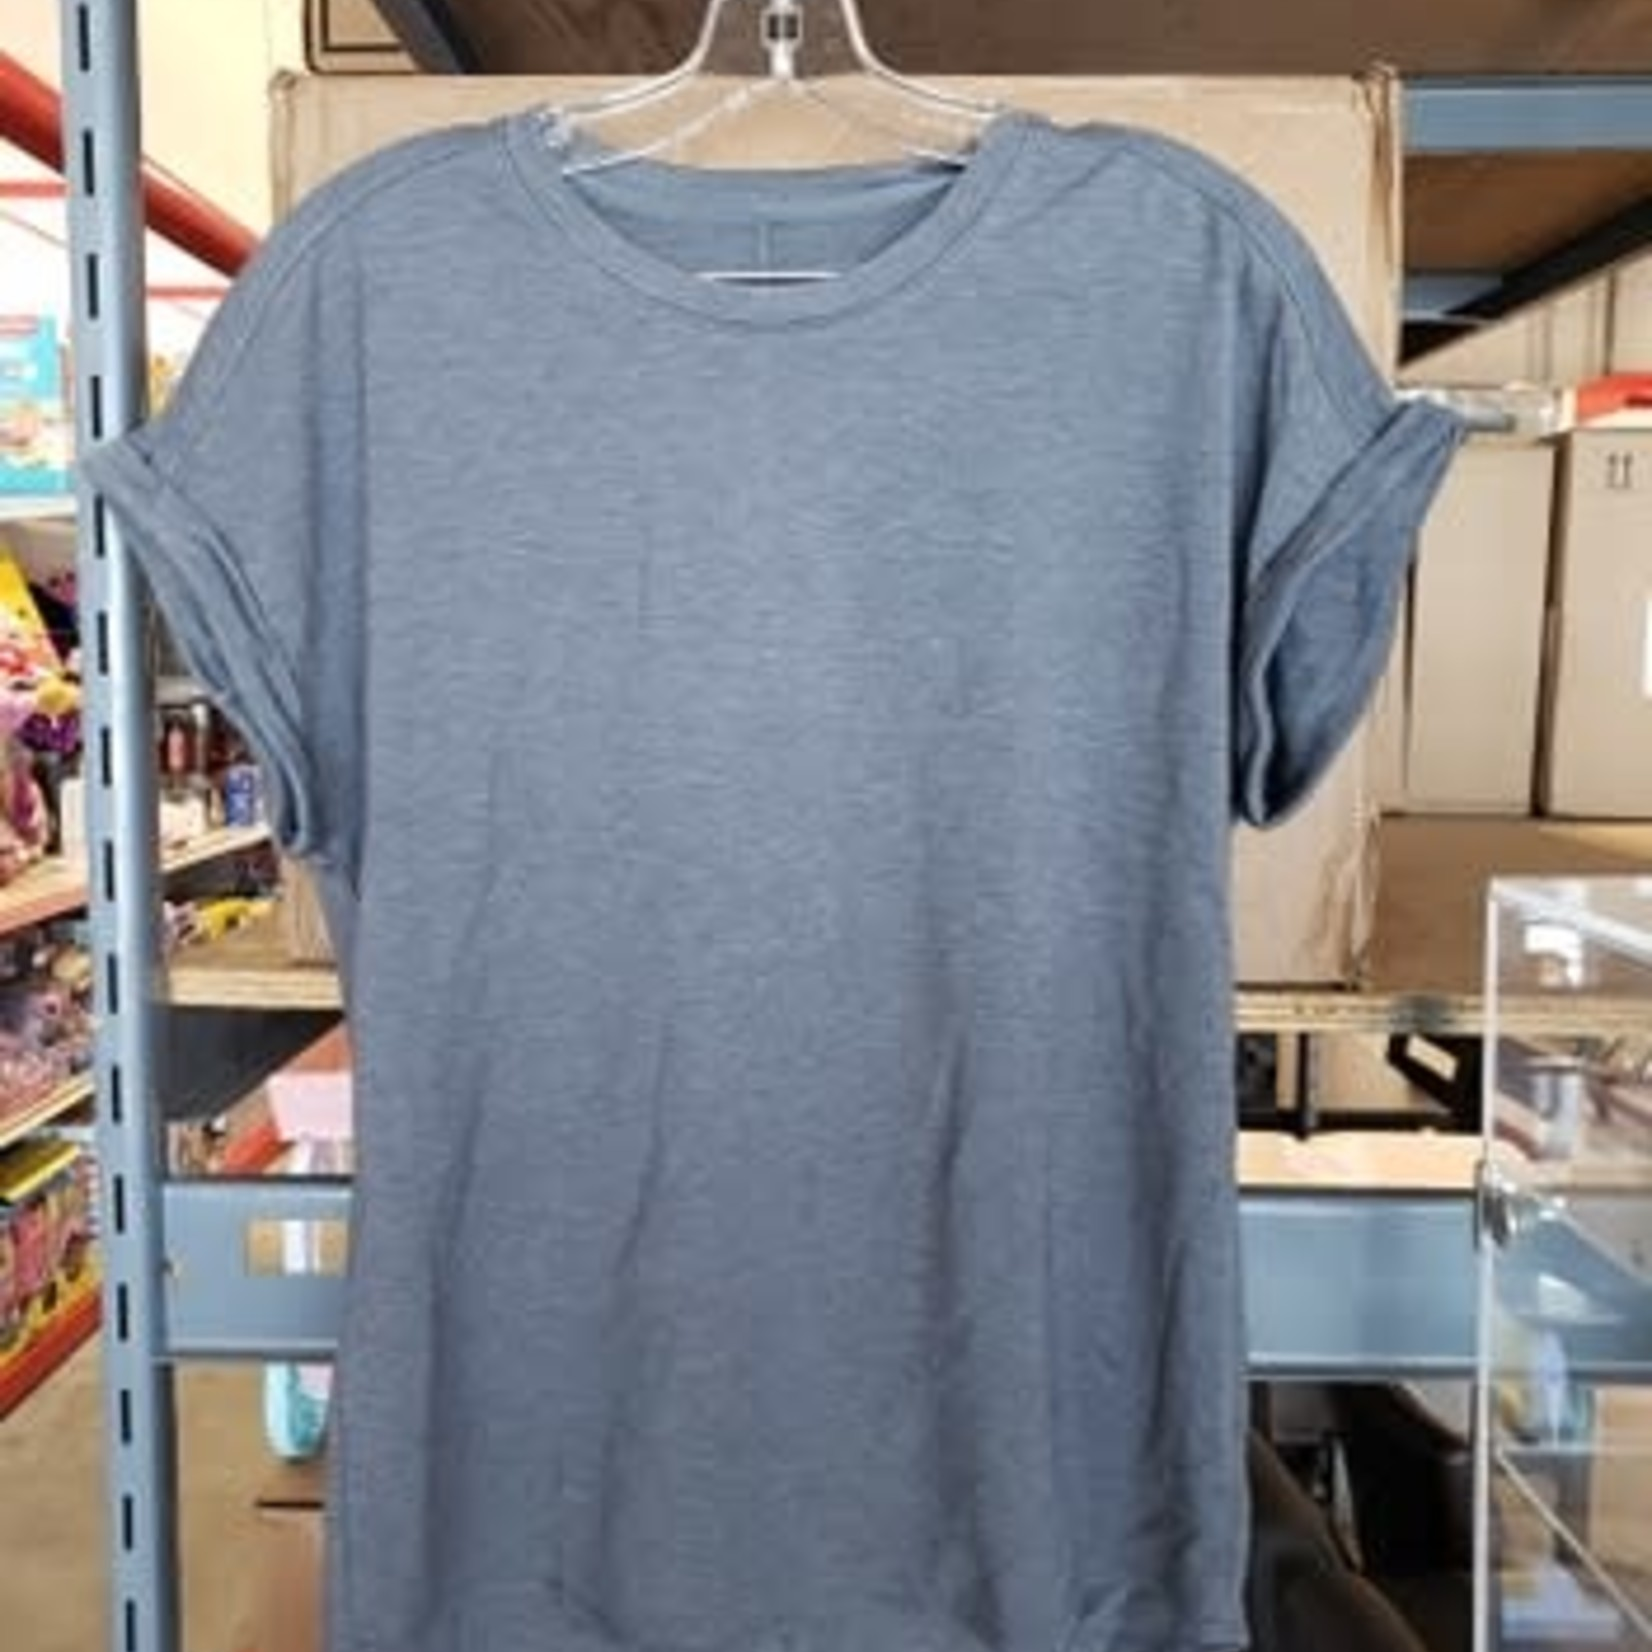 Tuff Athletics T-shirt